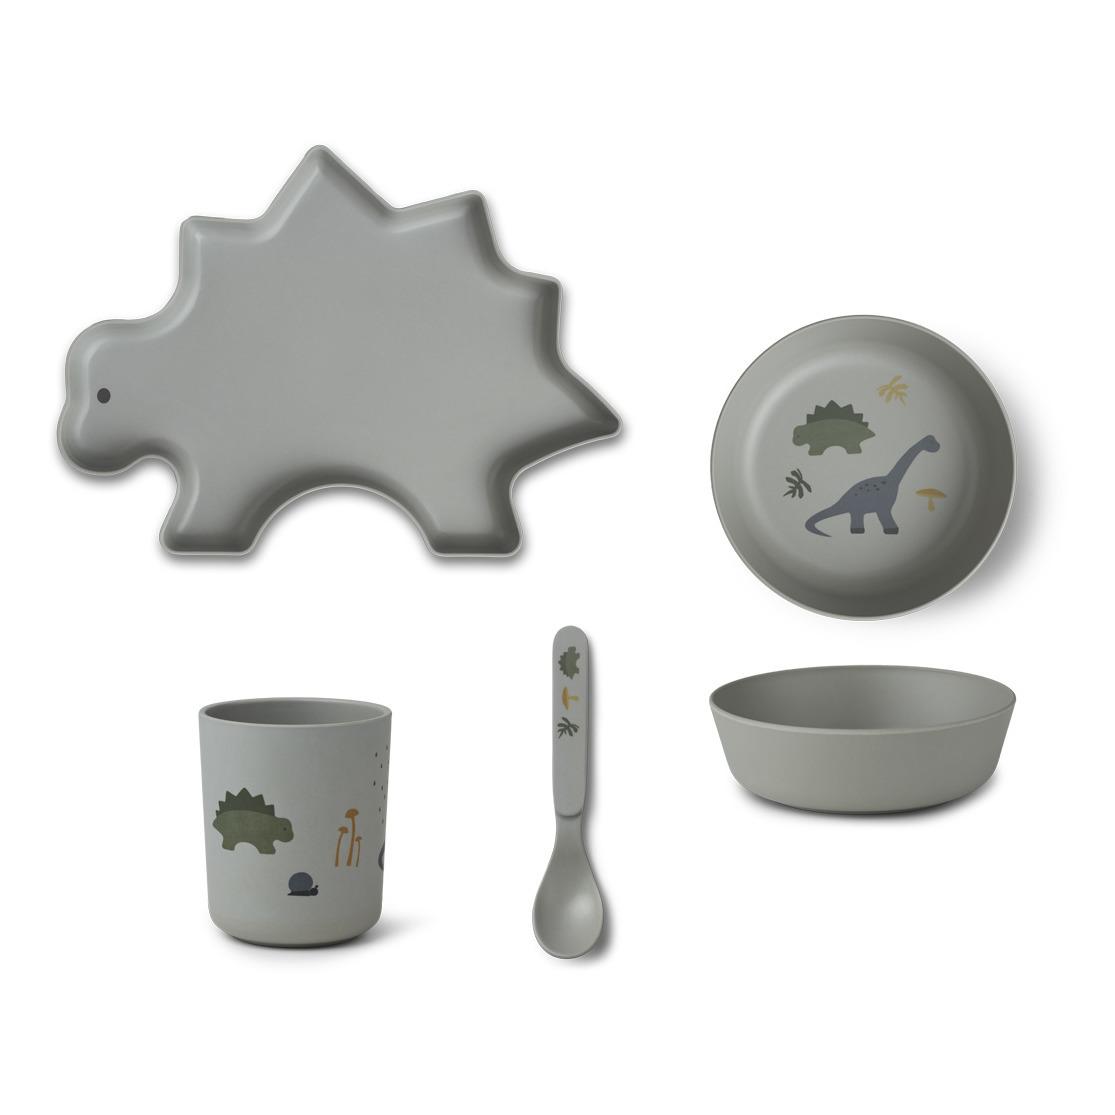 liewood //恐竜バンブー食器セット(ライトブルー)